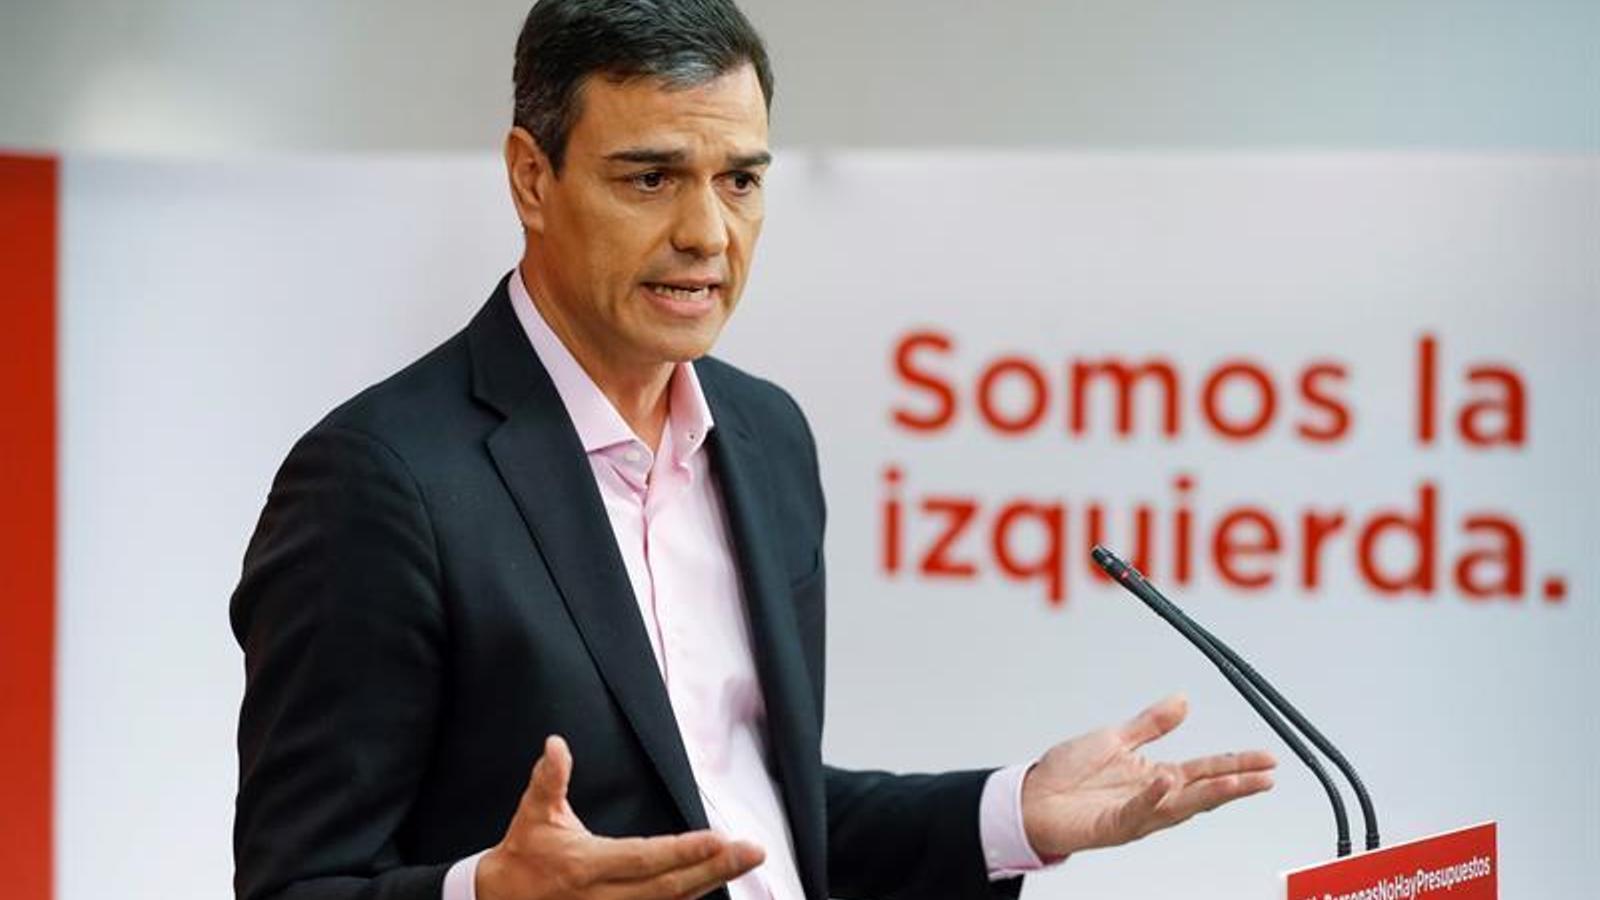 El president del govern espanyol, Pedro Sánchez, en una imatge recent.